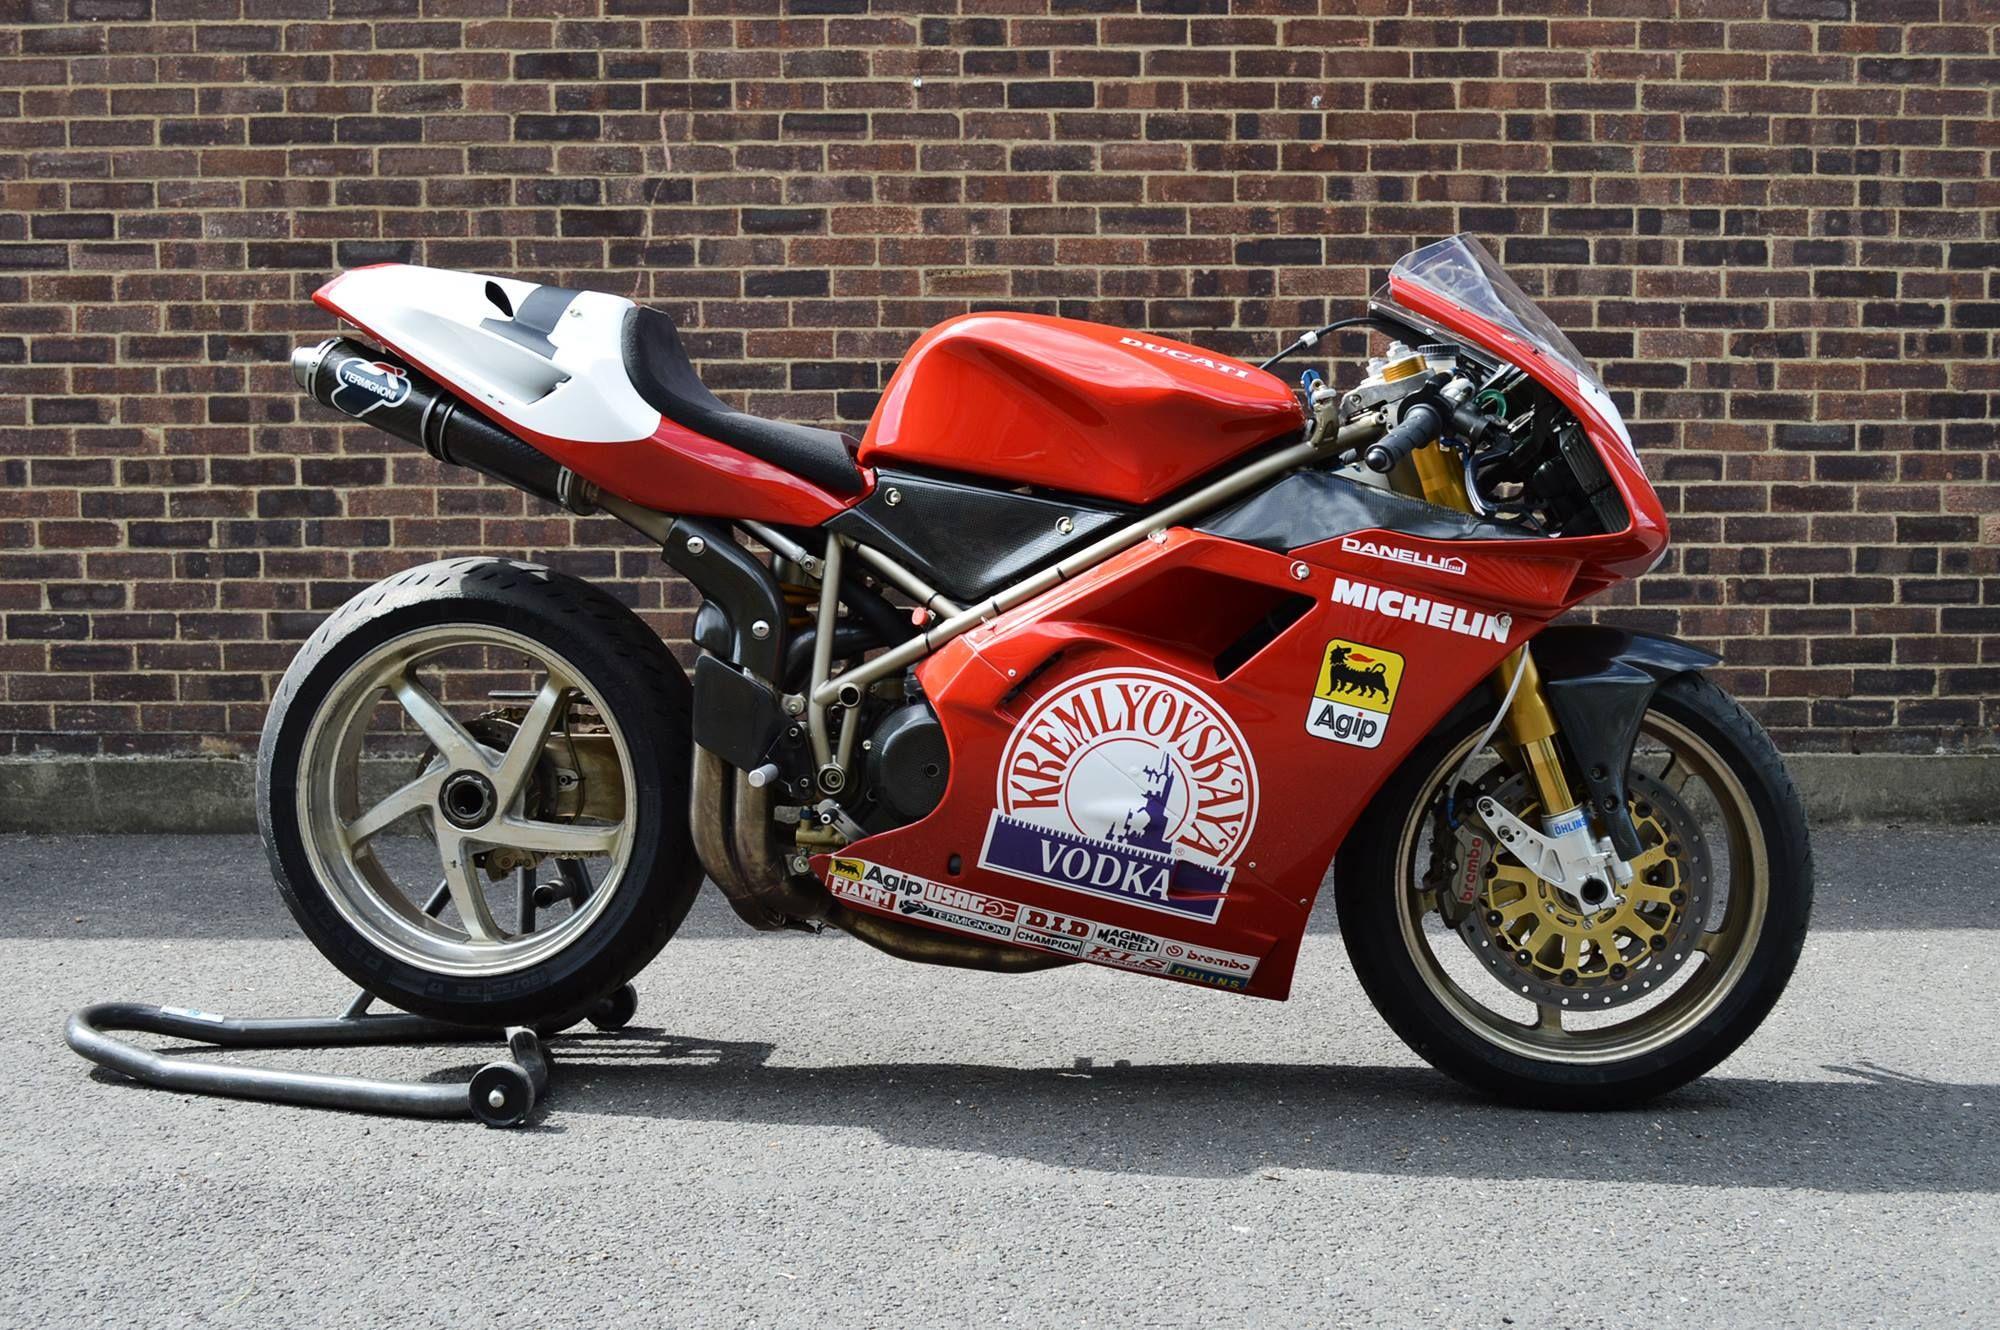 Imagine Ducati being sponsored by Vodka.